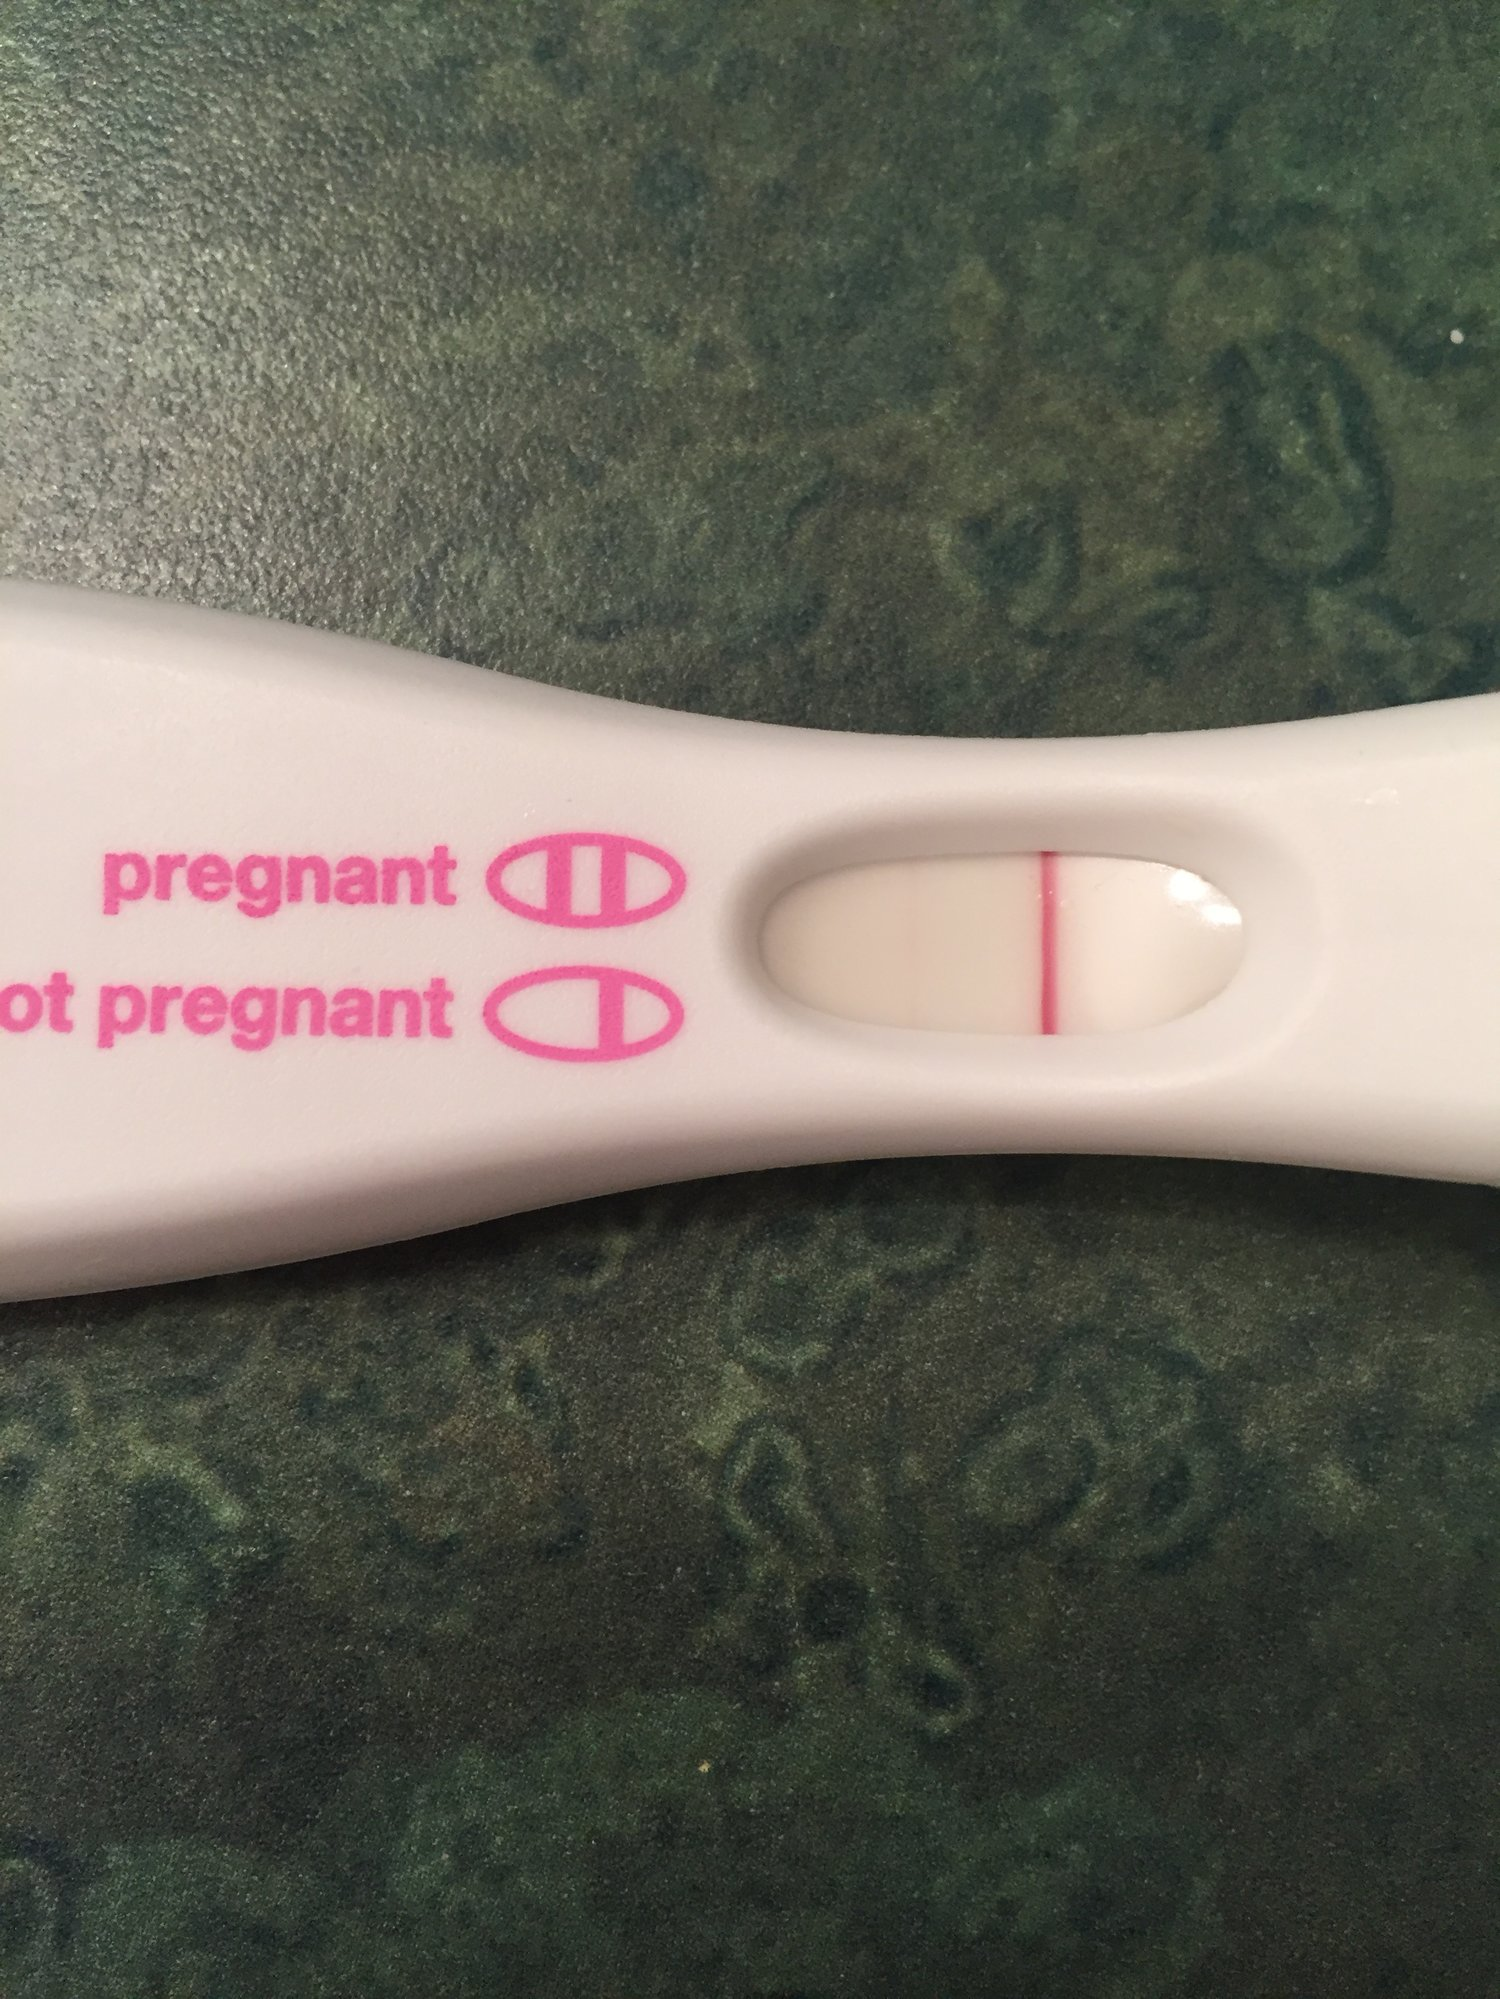 Positive Pregnancy Test On Sink - Pregnancy Symptoms